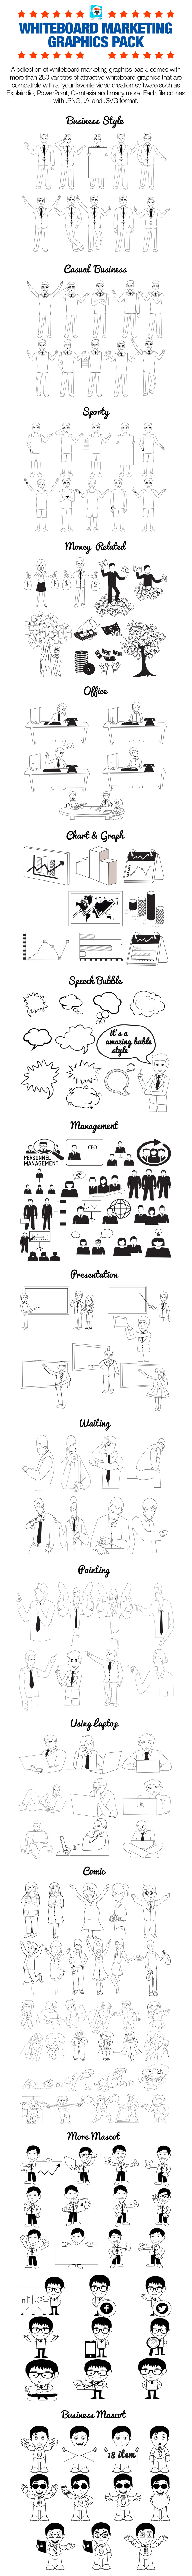 WhiteboardMarketingGraphicsPack